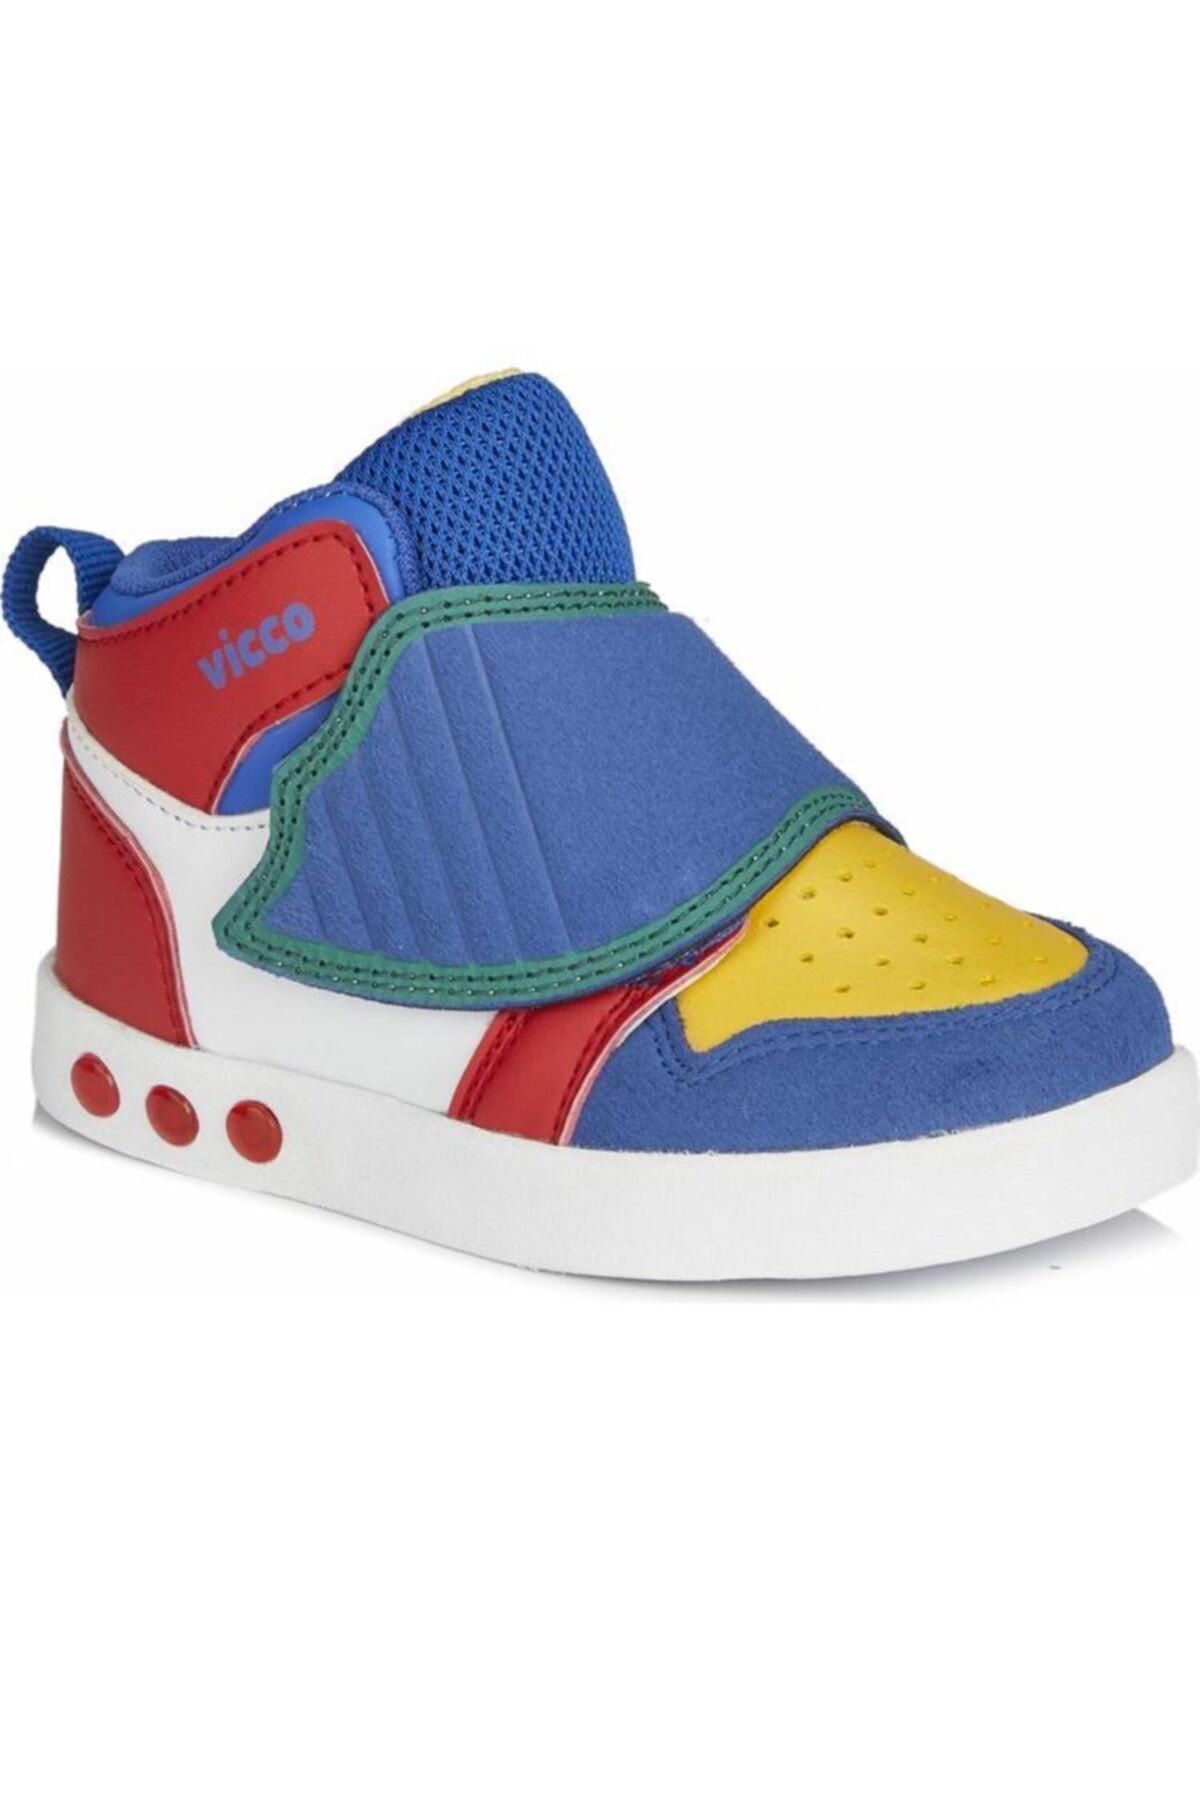 Vicco Mega Ayakkabı 1